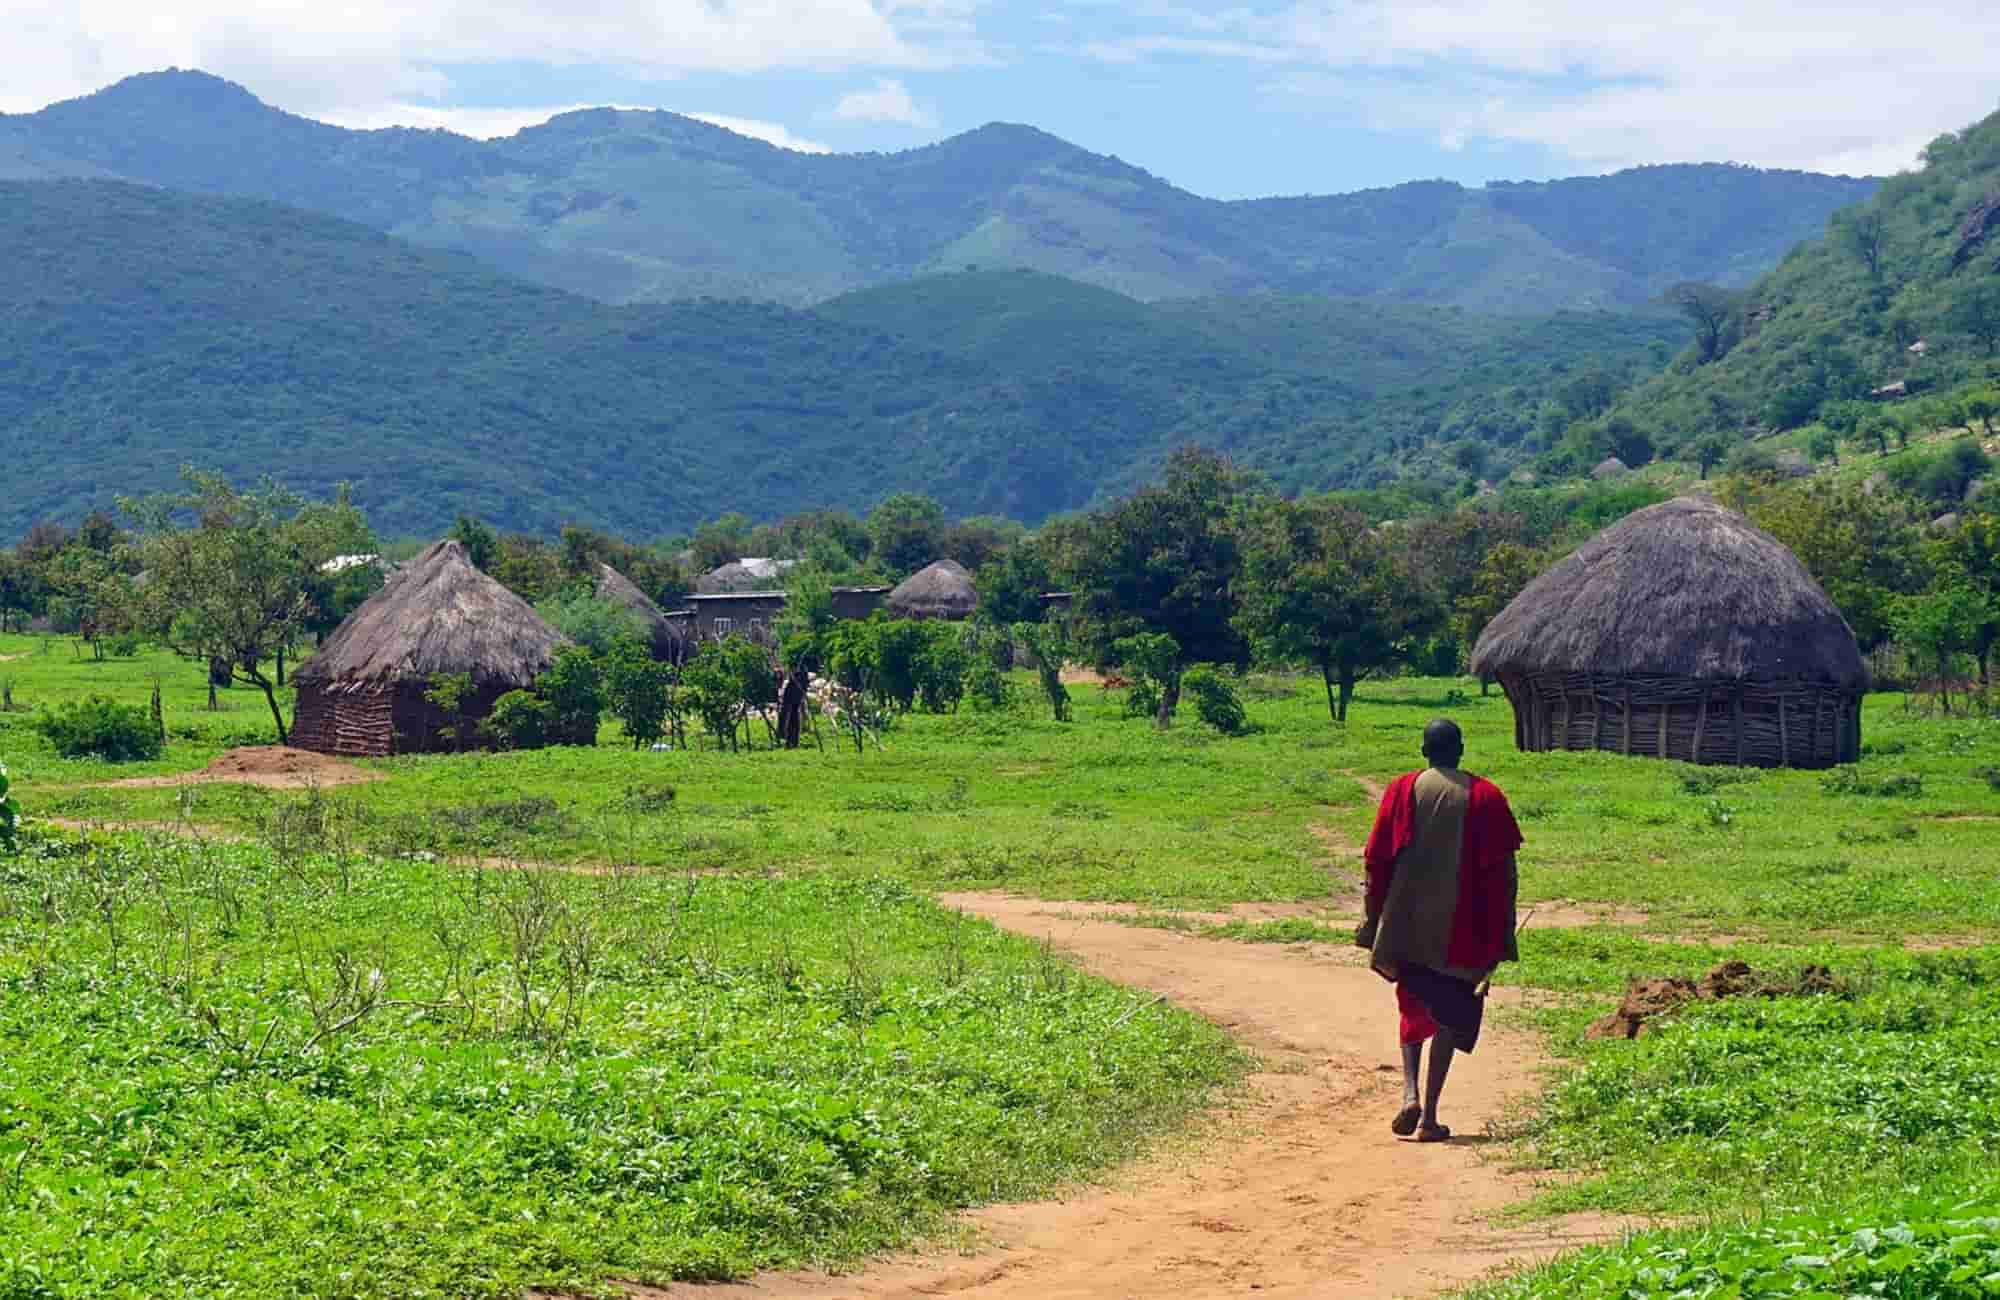 Voyage en Tanzanie - Invitation dans un village Massaï - Amplitudes